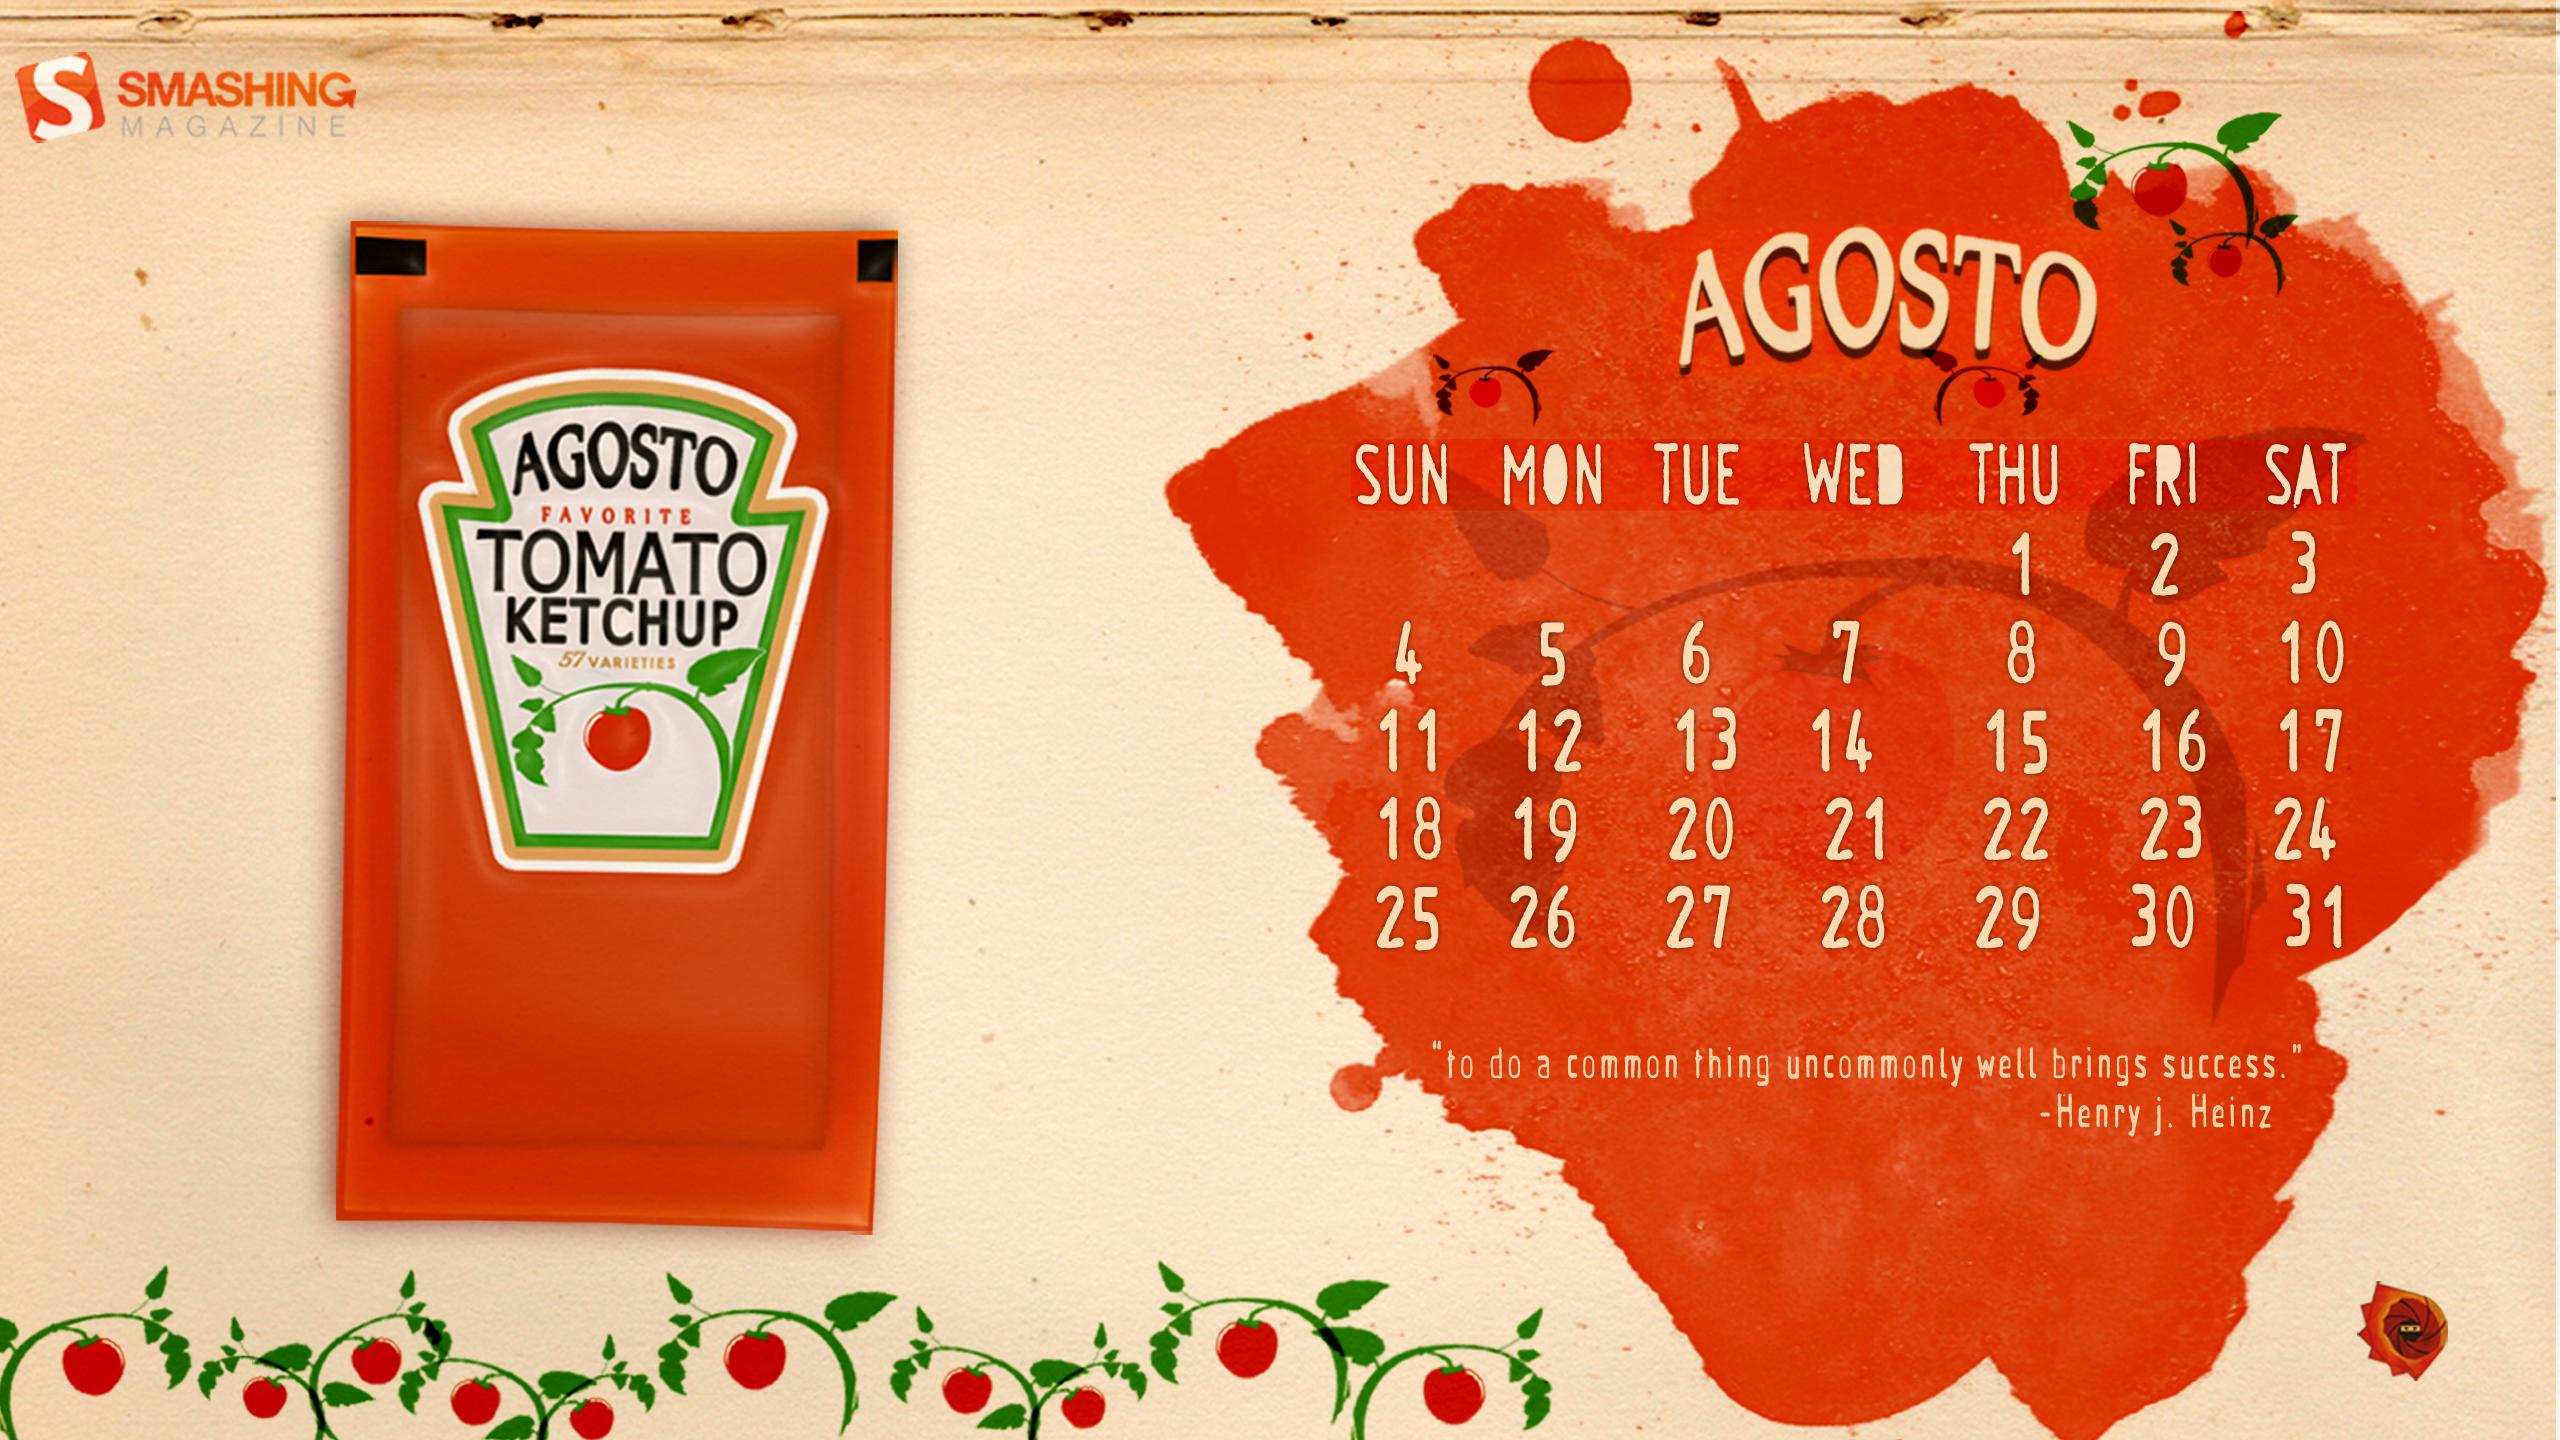 Desktop Wallpaper Calendars: August 2013 – Smashing Magazine